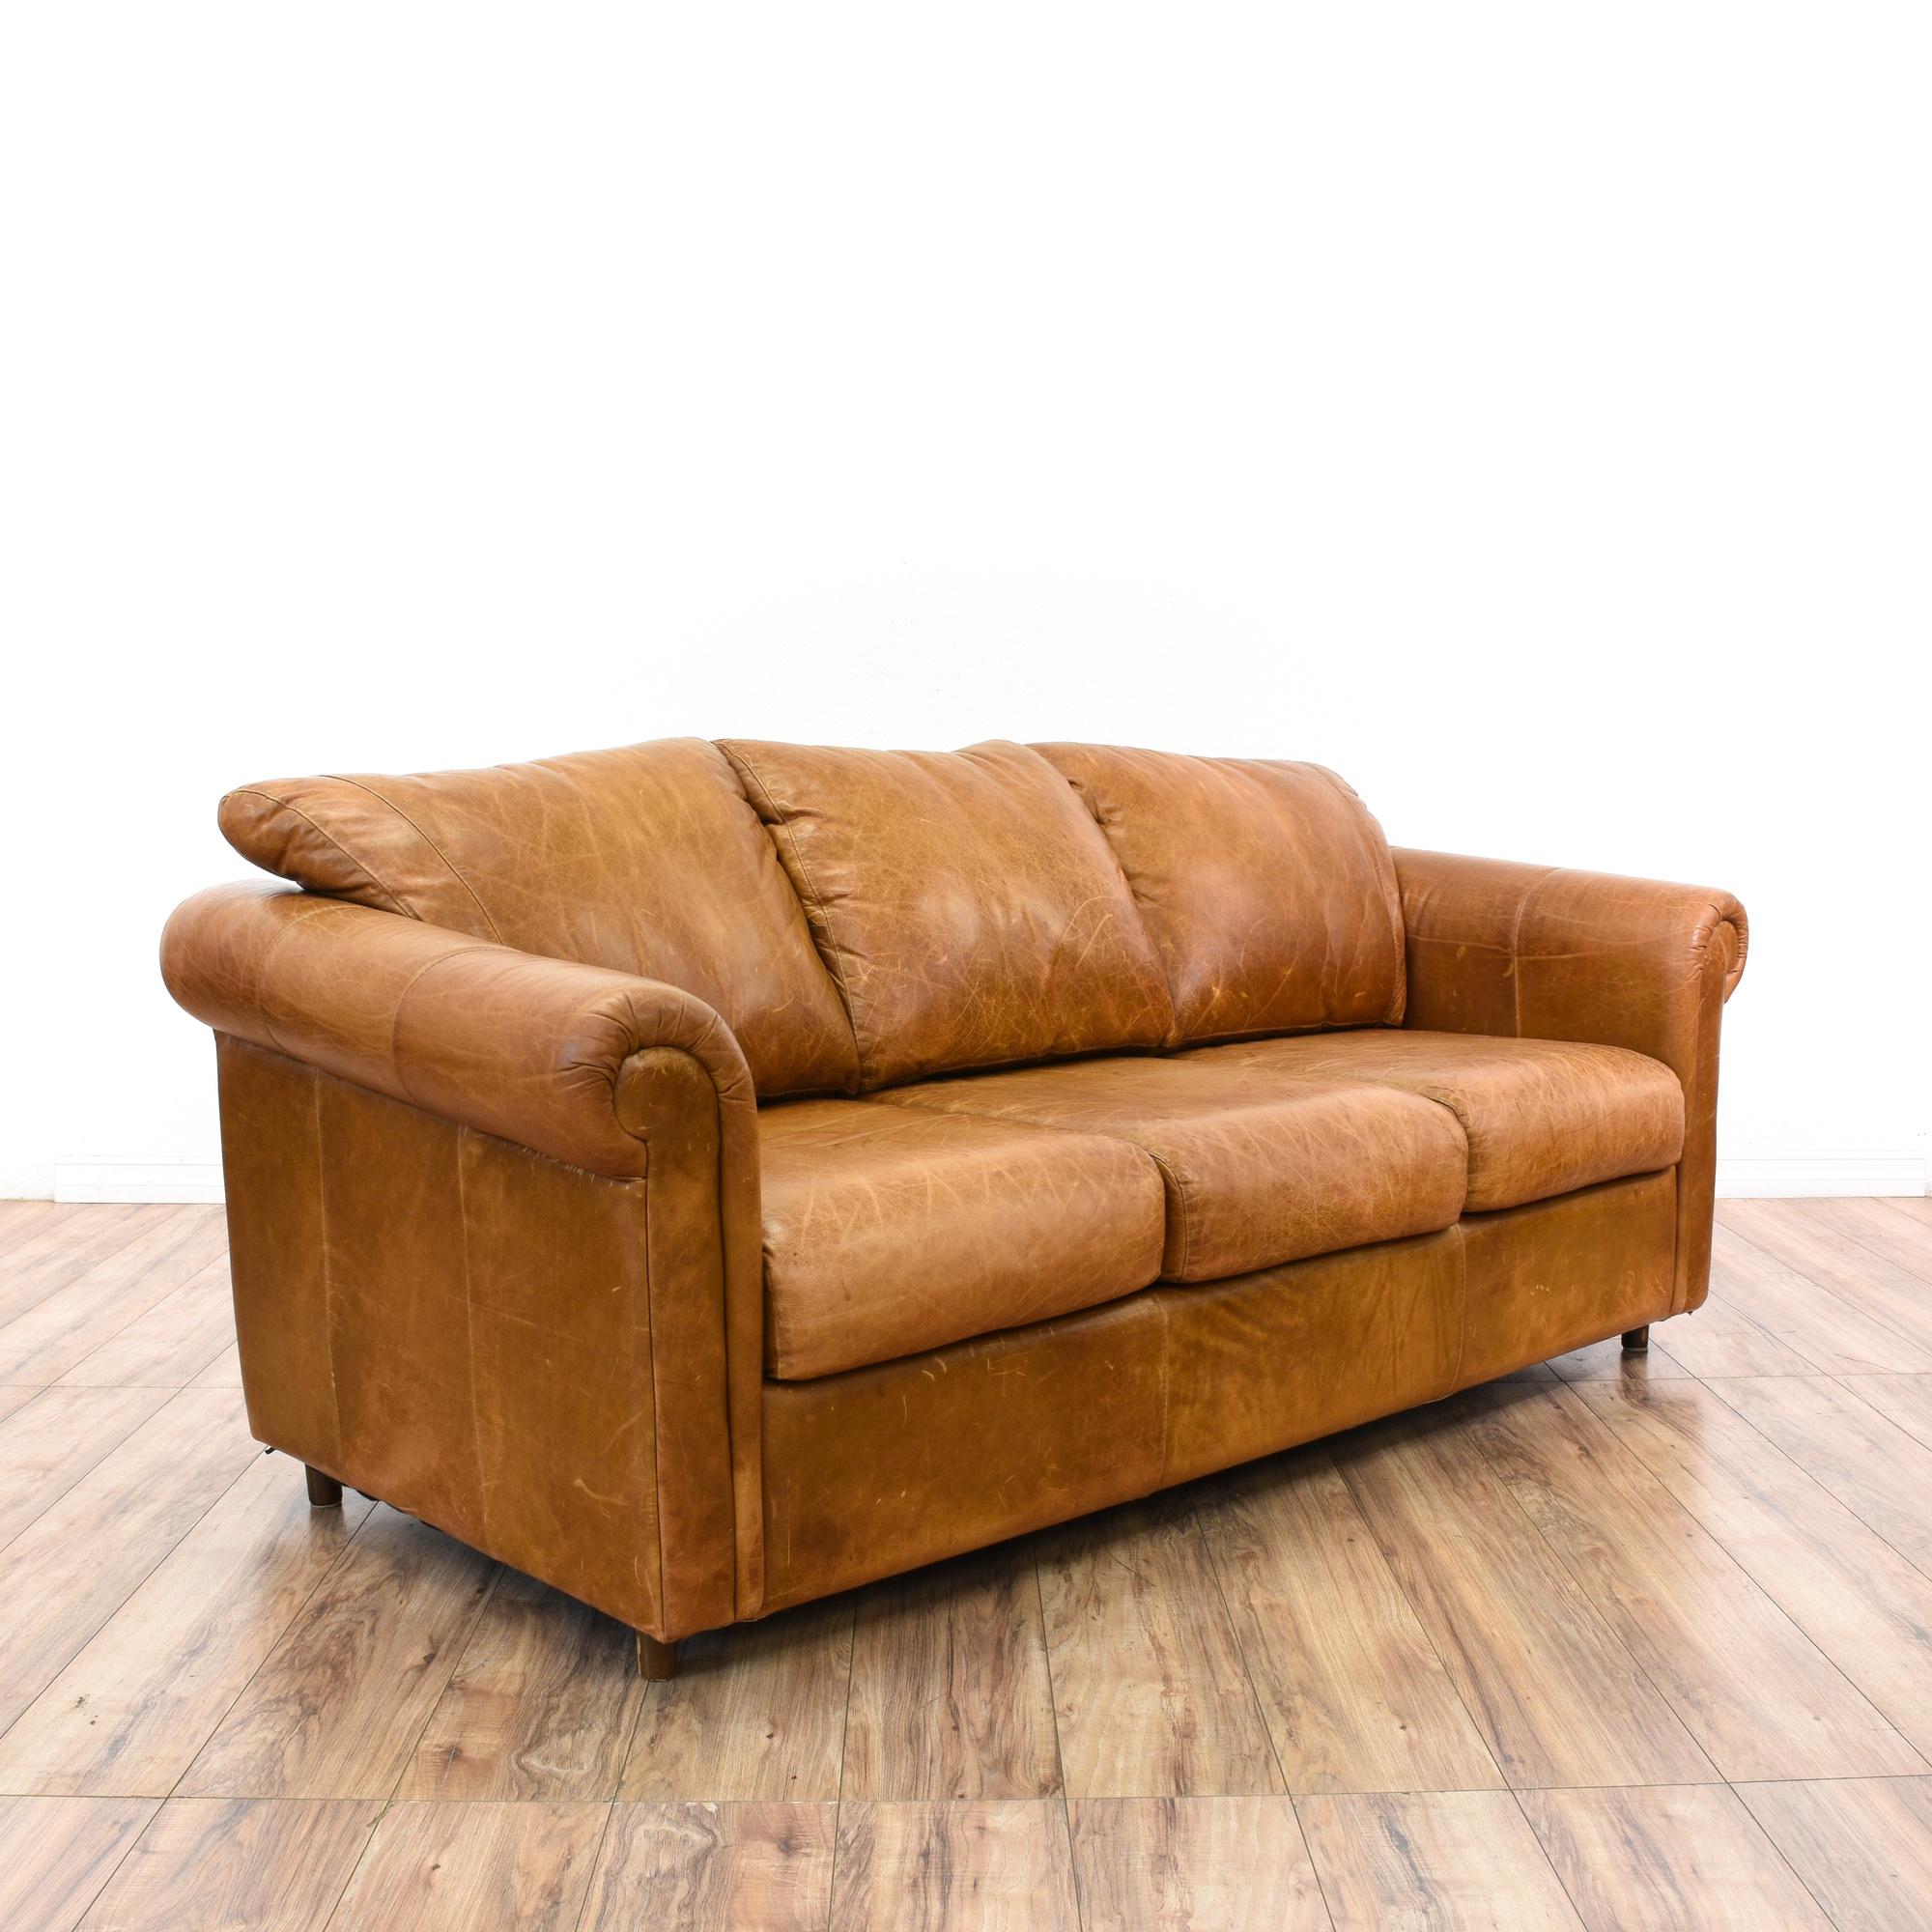 Distressed Camel Leather Sleeper Sofabed Loveseat Vintage Furniture San Diego Los Angeles